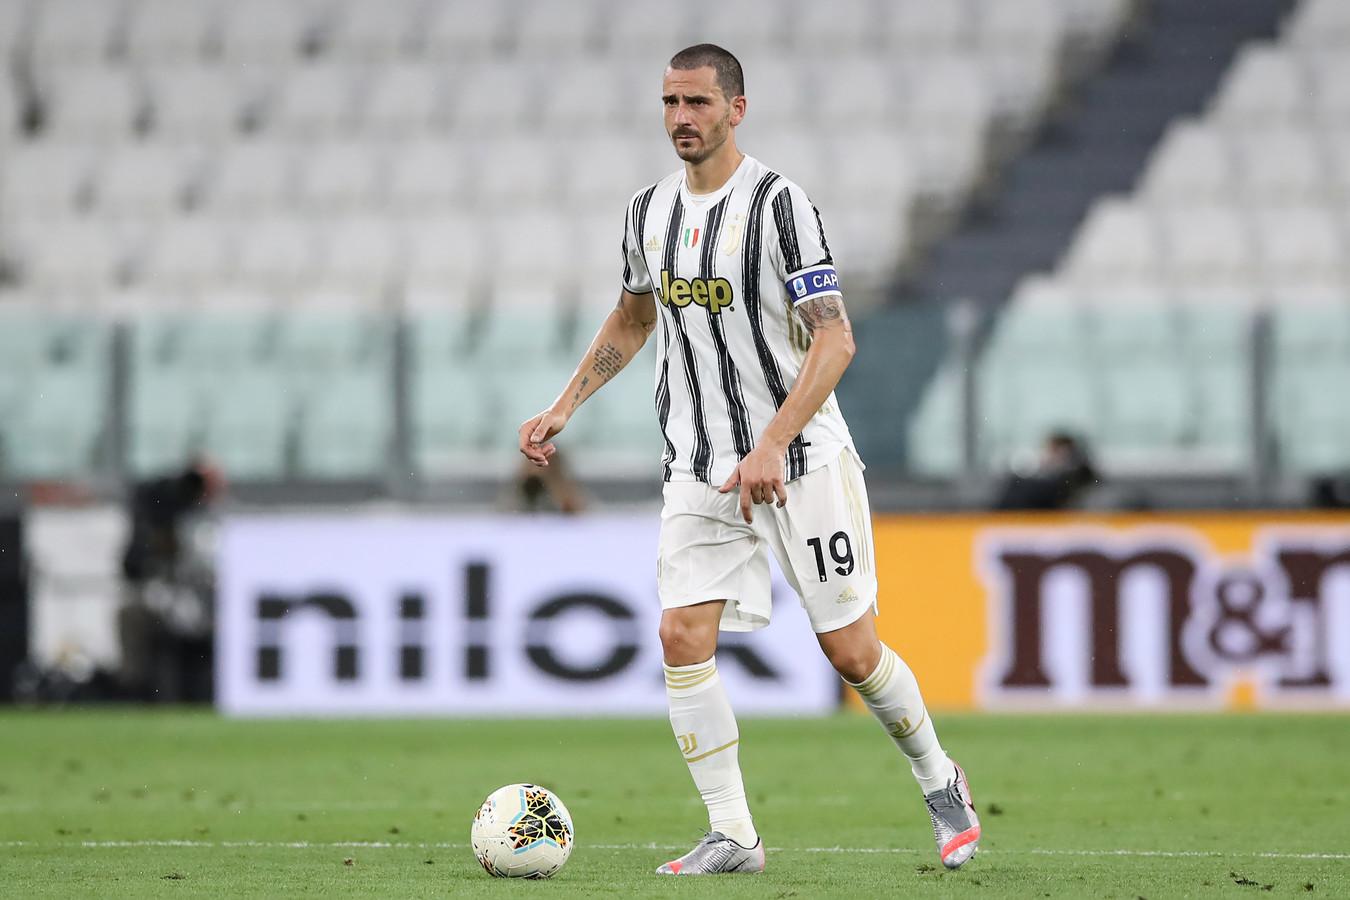 De Italiaanse topscorer bij Juventus: Leonardo Bonucci.